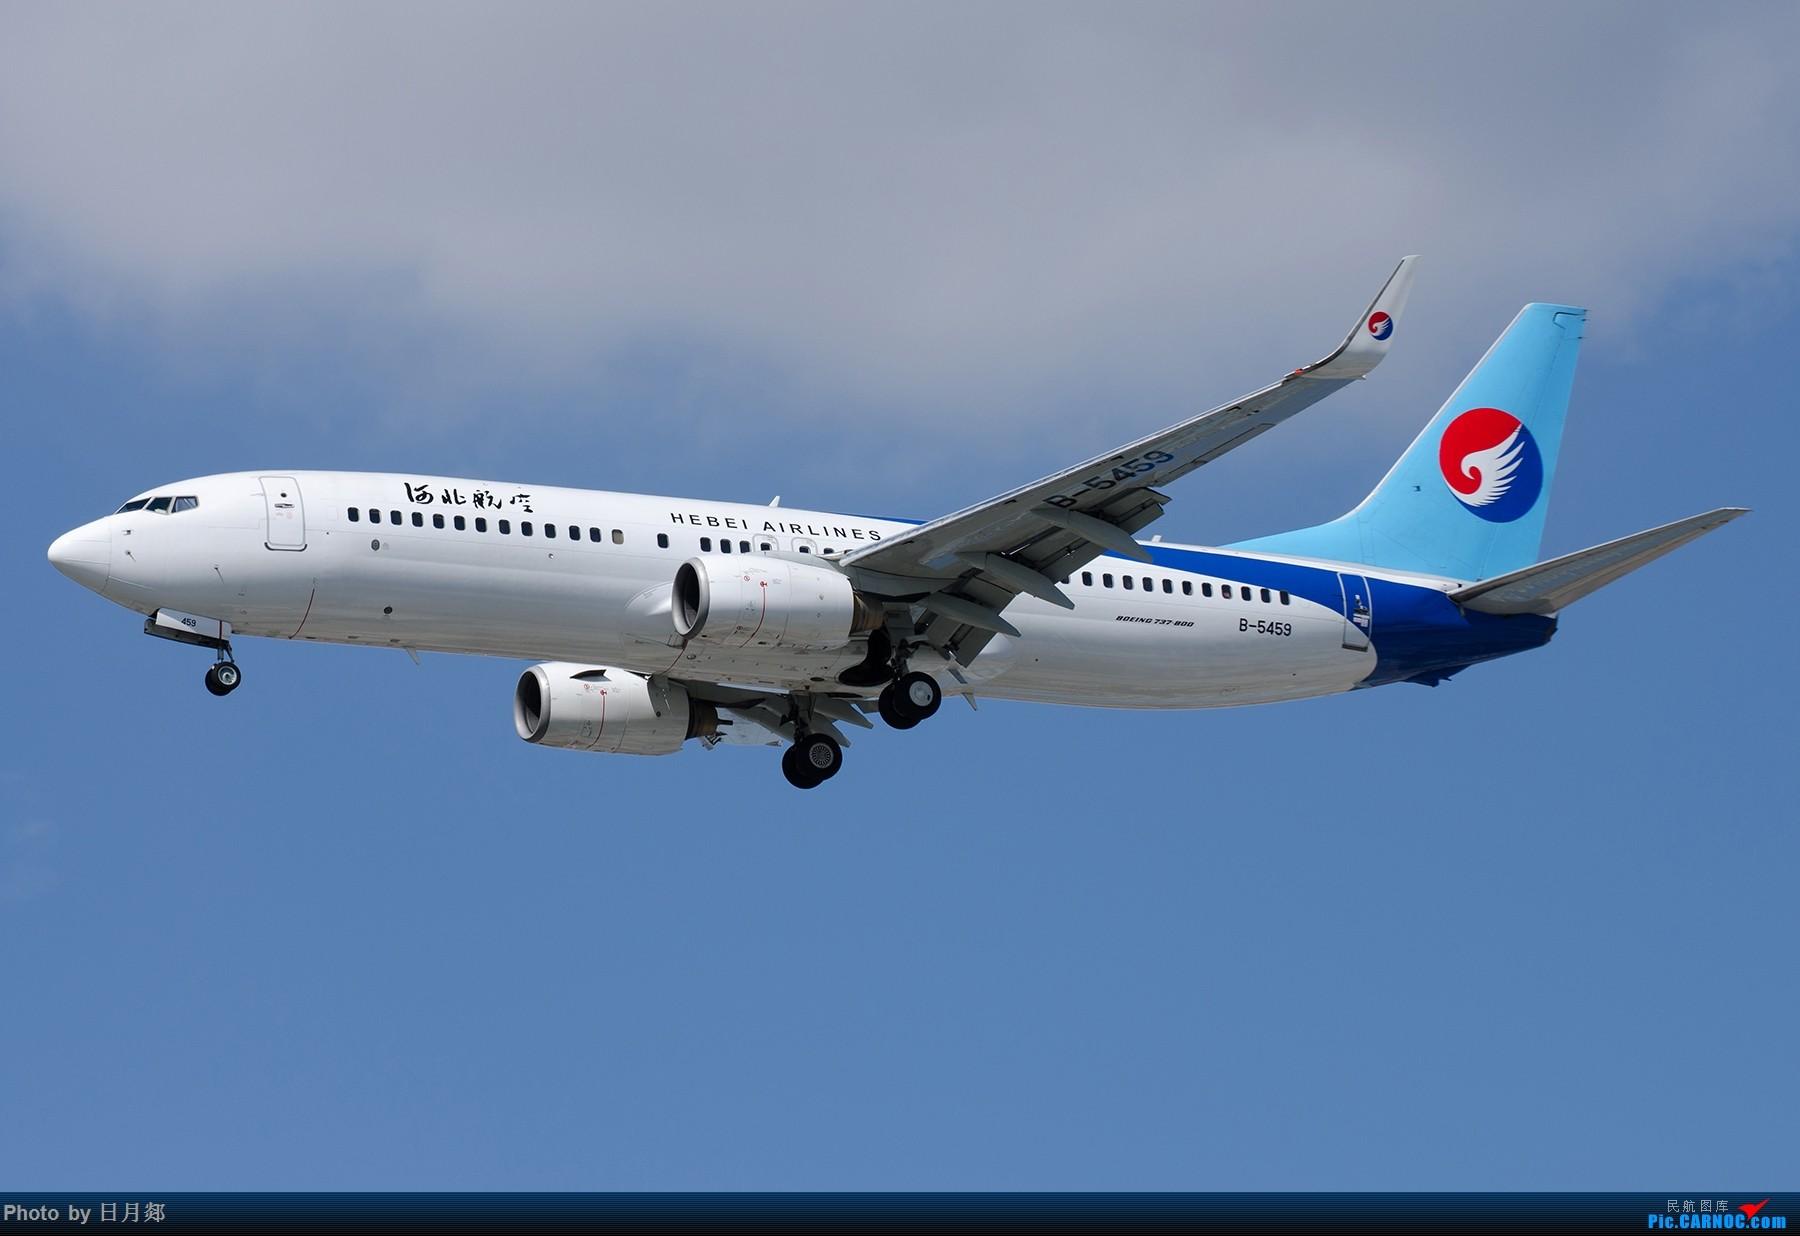 Re:[原创]【SHA拍机*1800大图】国庆的存货接着发,台风啥时候才能过去 BOEING 737-800 B-5459 中国上海虹桥国际机场